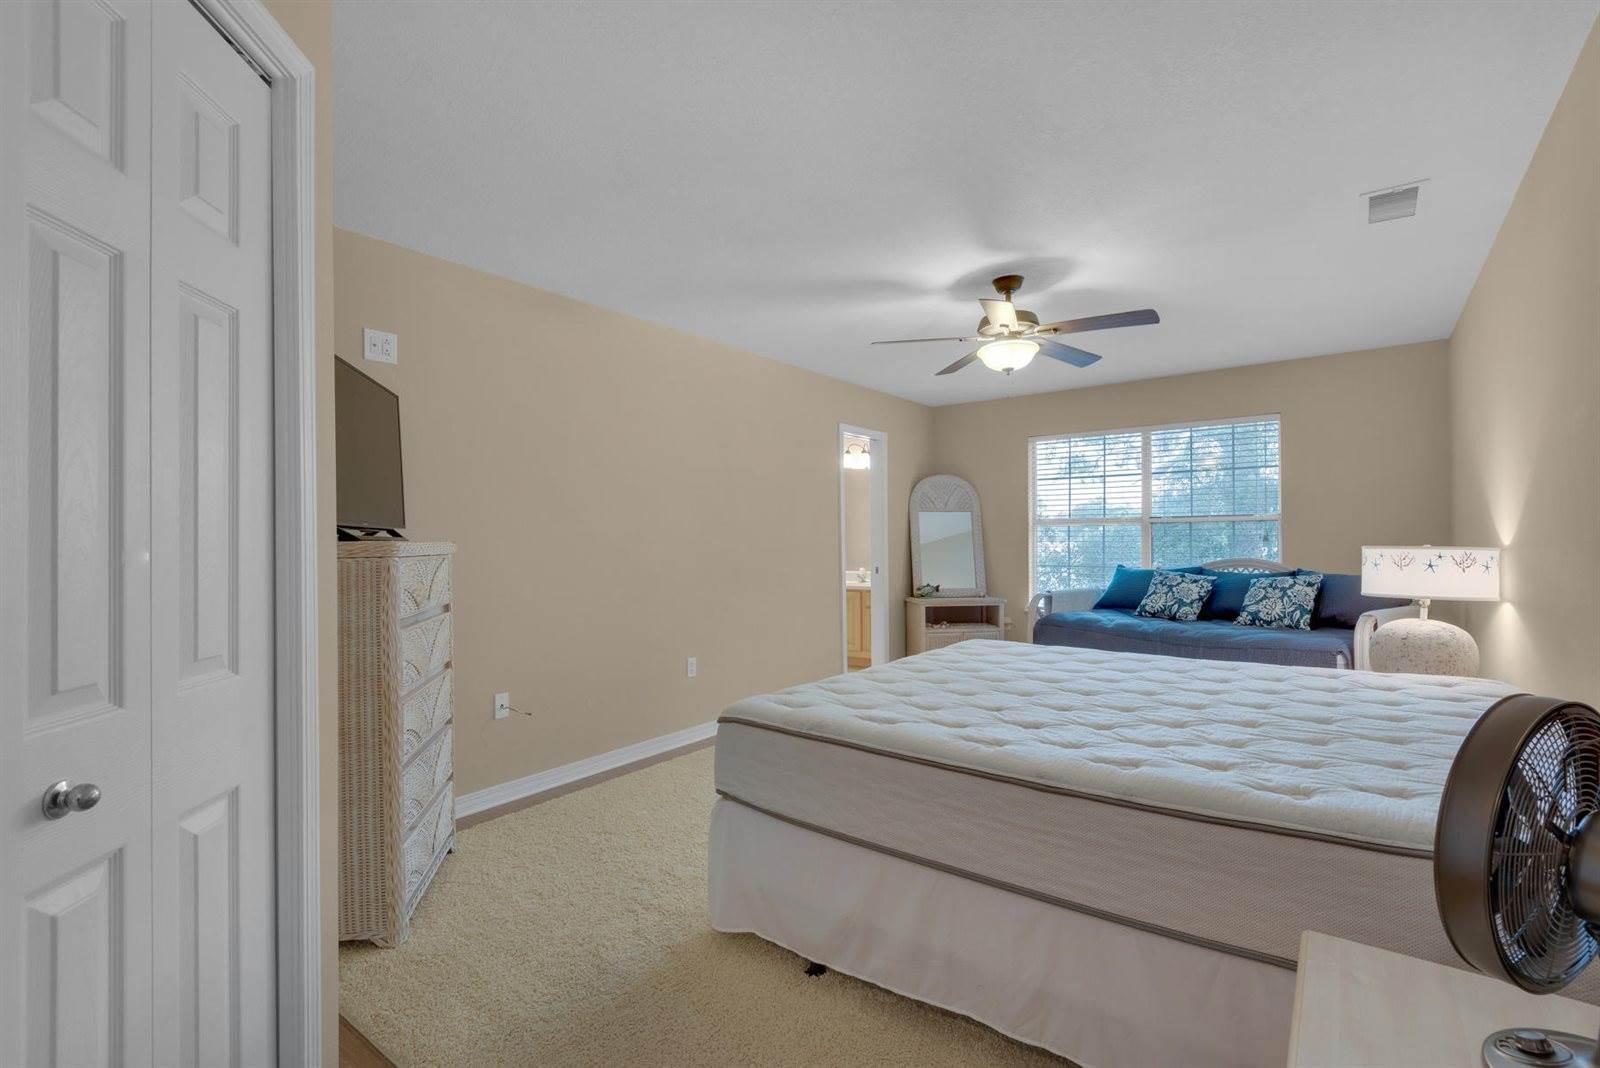 752 Toness Way, Fort Walton Beach, FL 32547